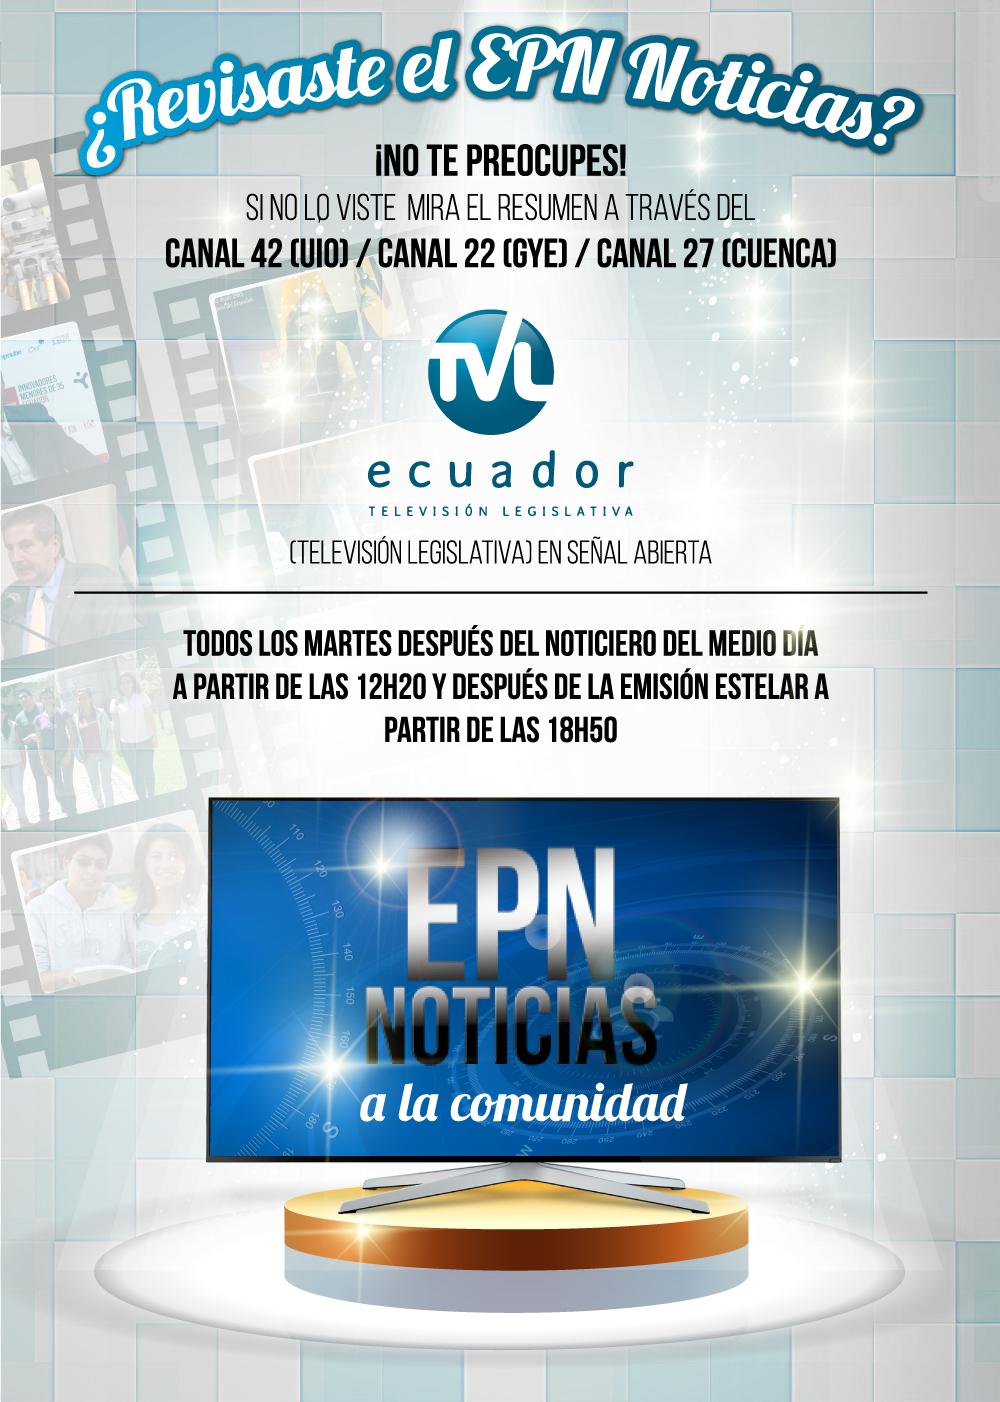 web_epn_news_TVL (1)